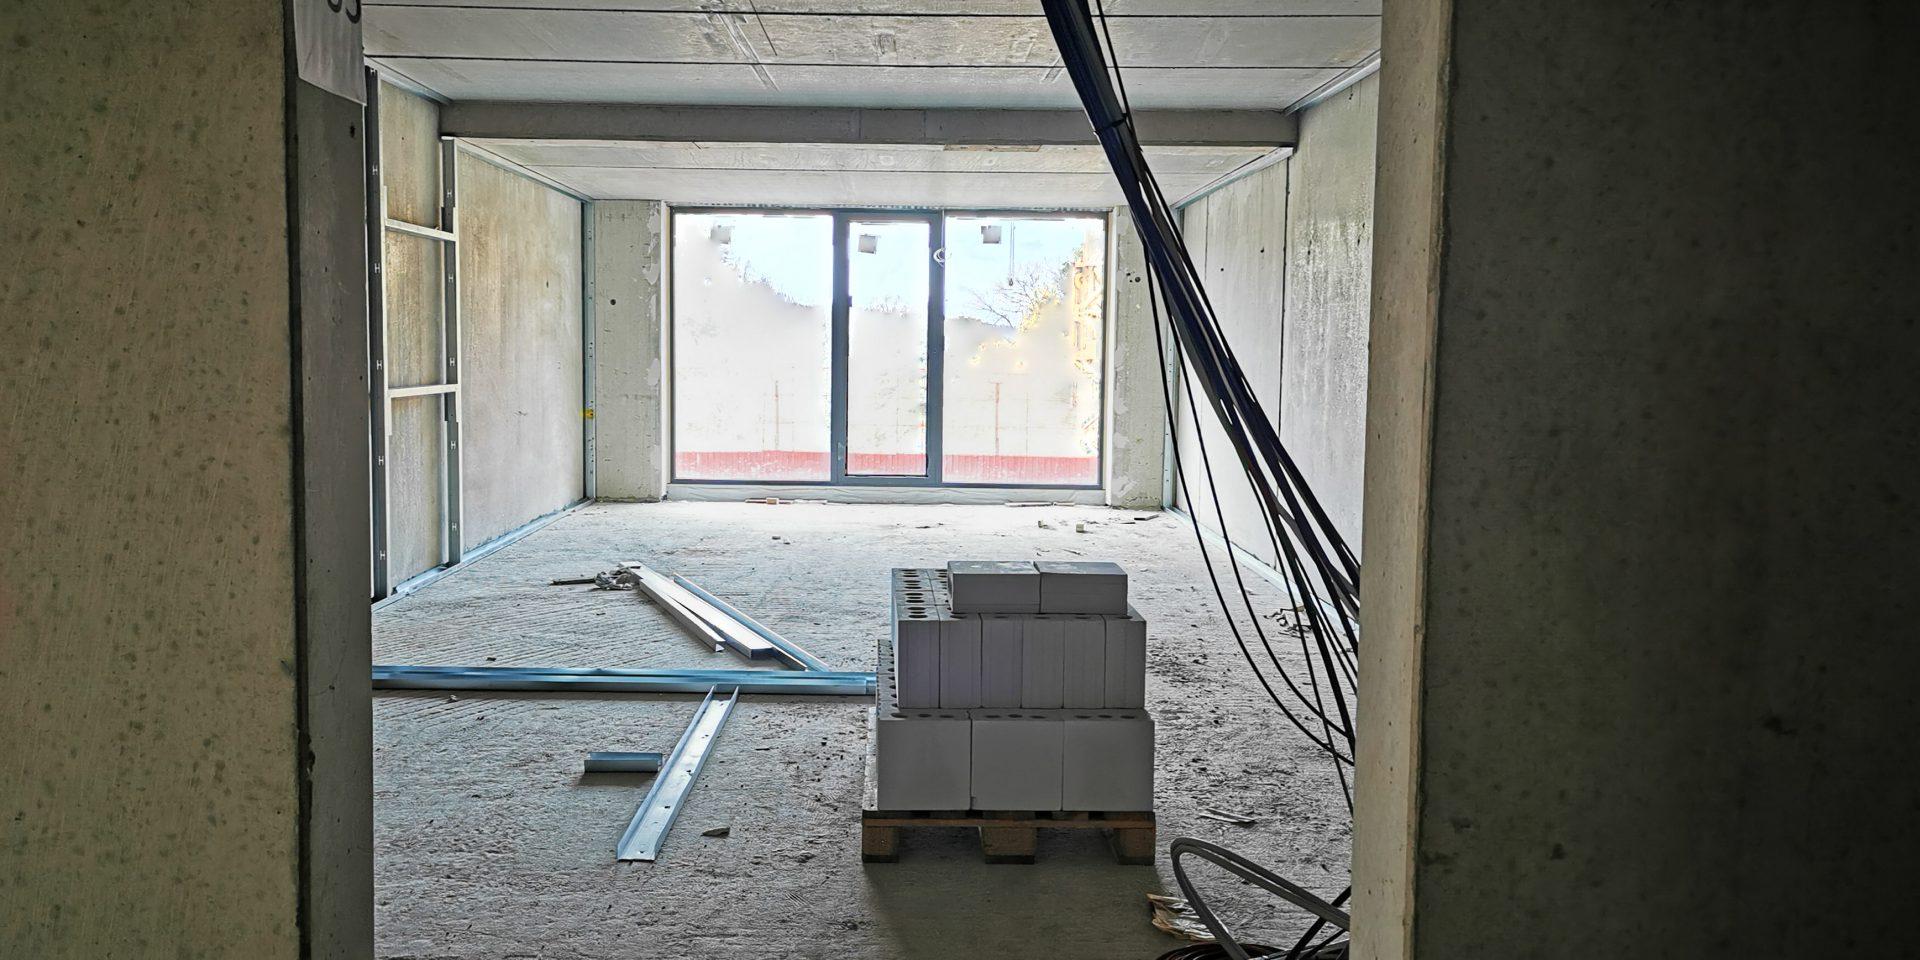 Kabelsalat auf der Baustelle